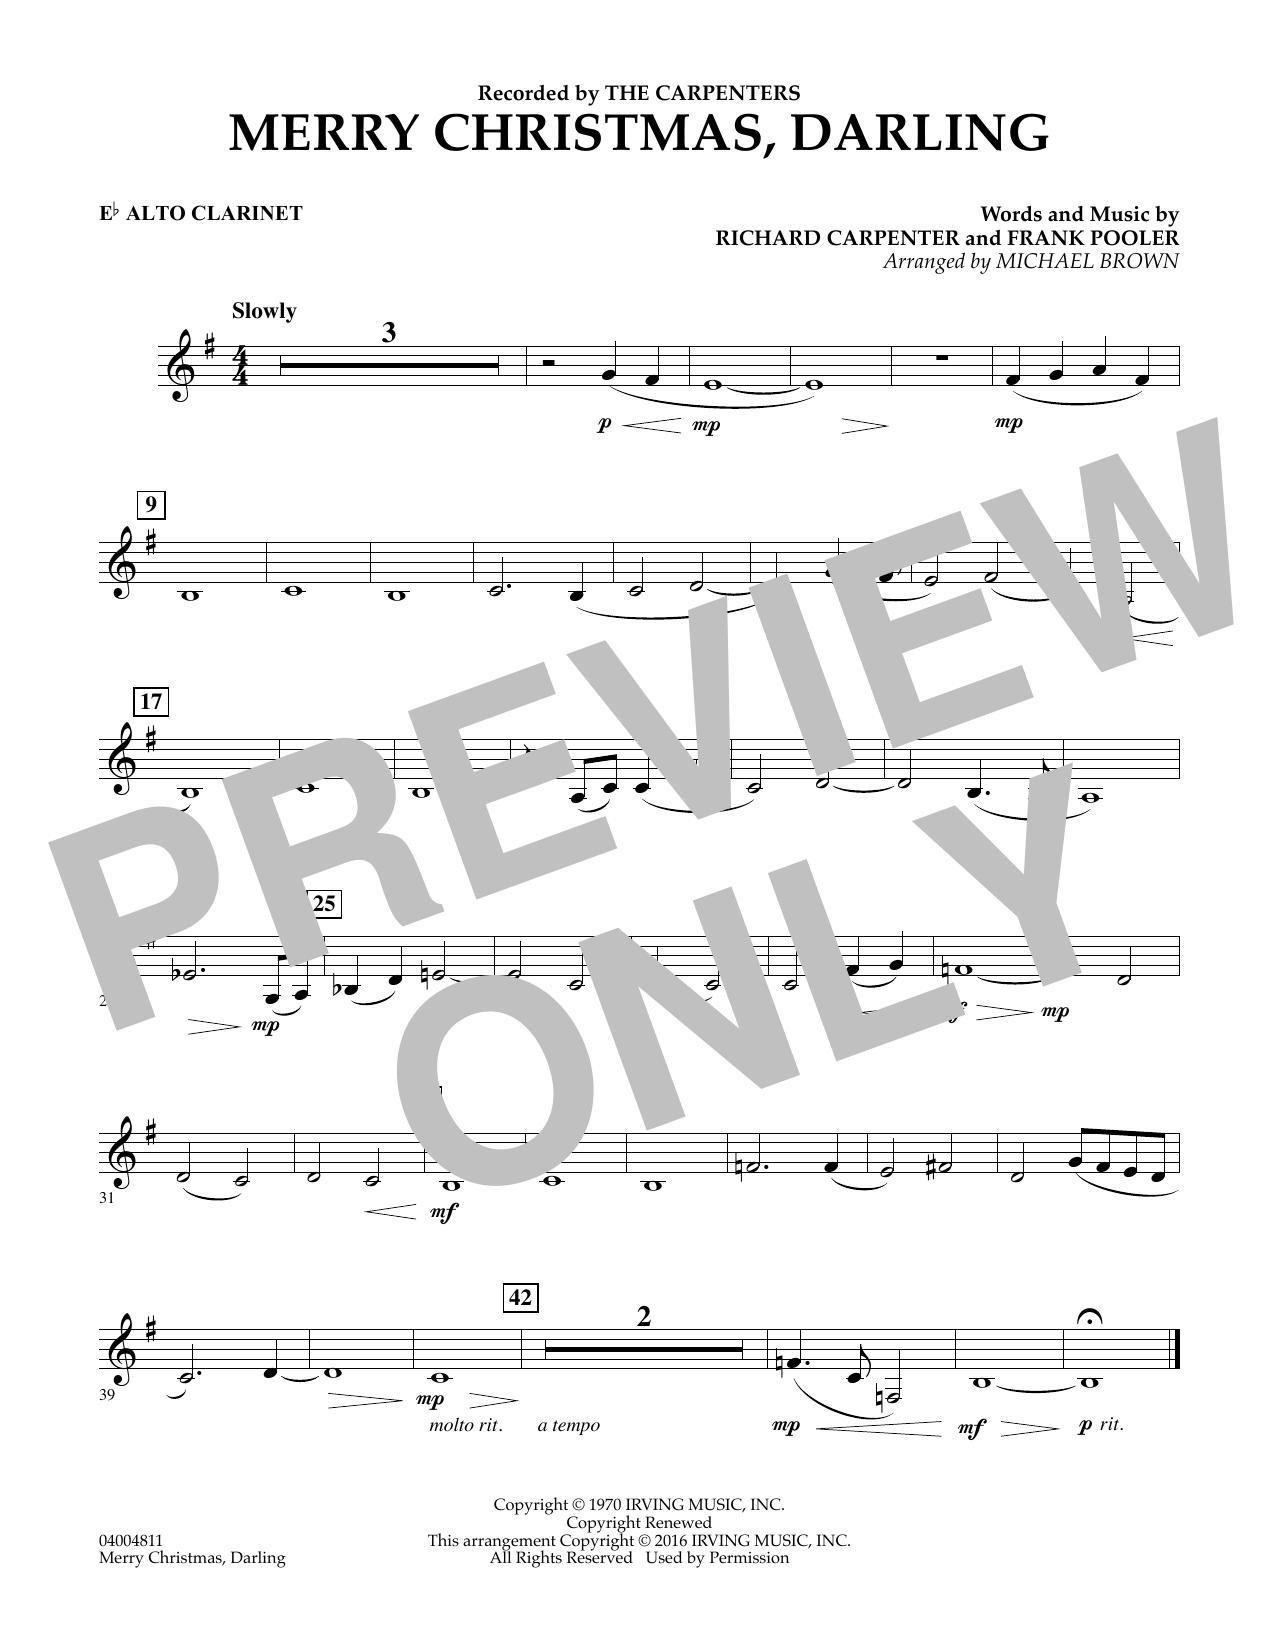 The Carpenters - Merry Christmas, Darling - Eb Alto Clarinet